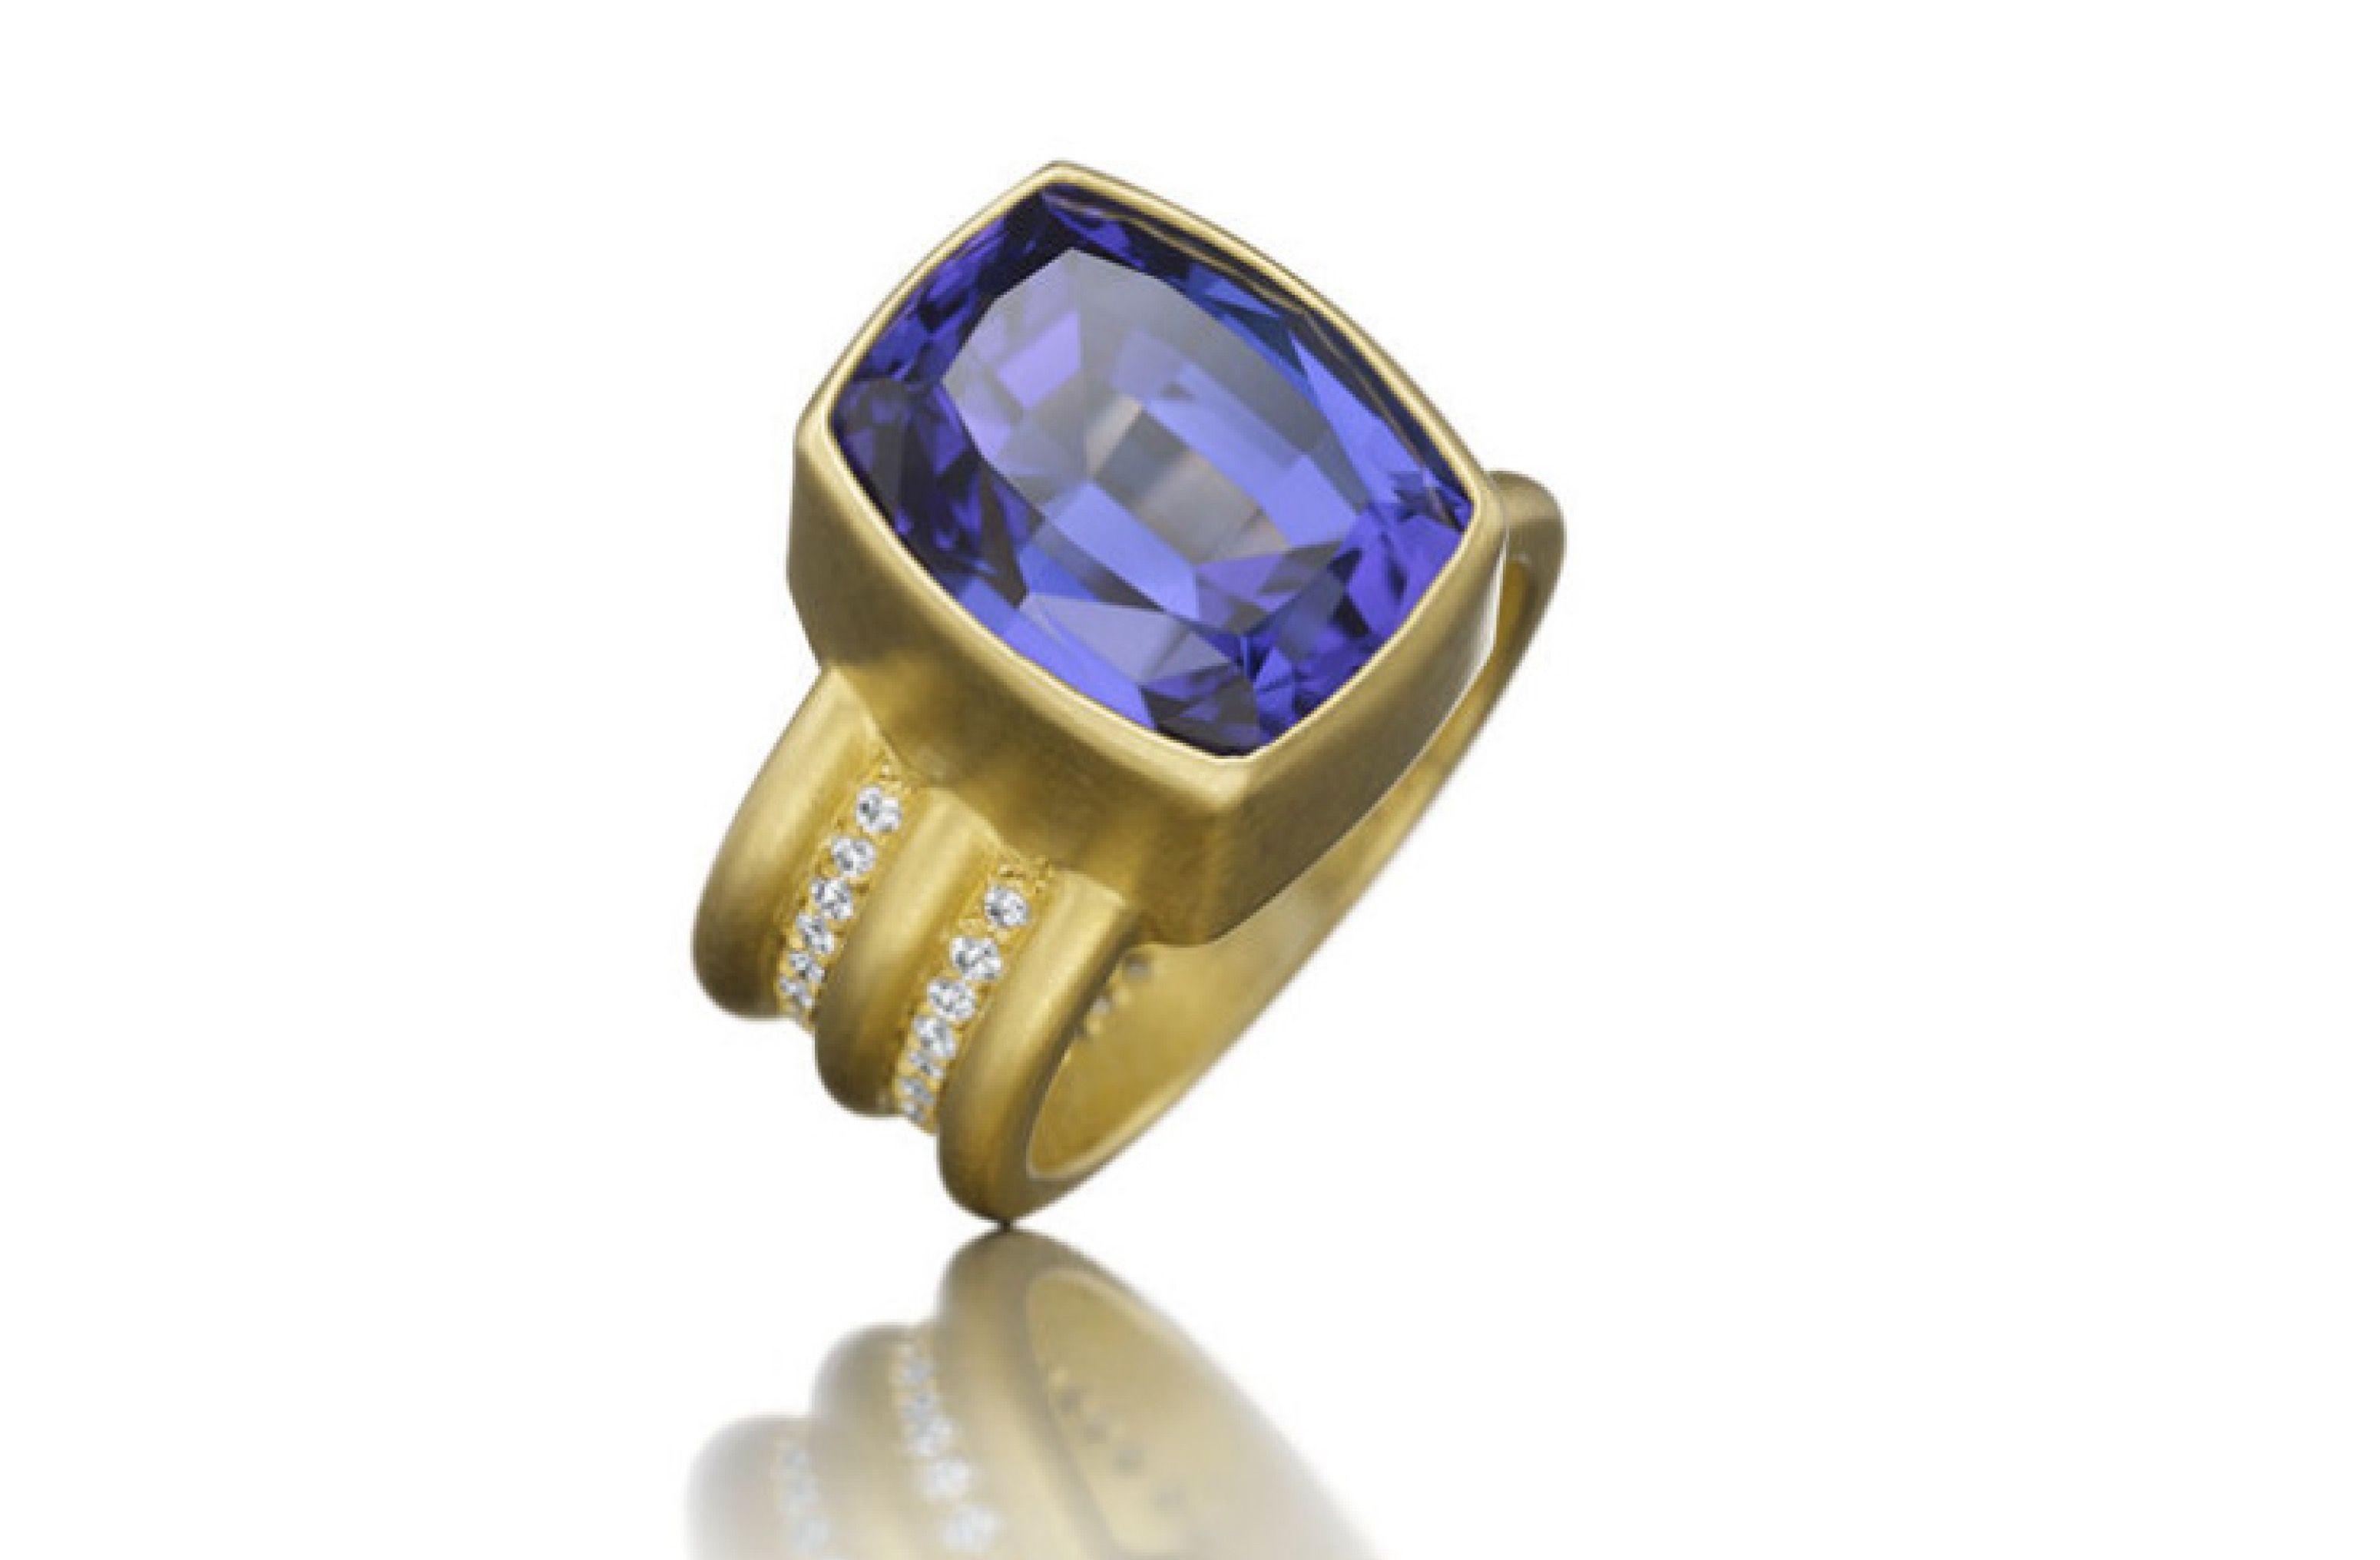 JewelryWhite_09.jpg